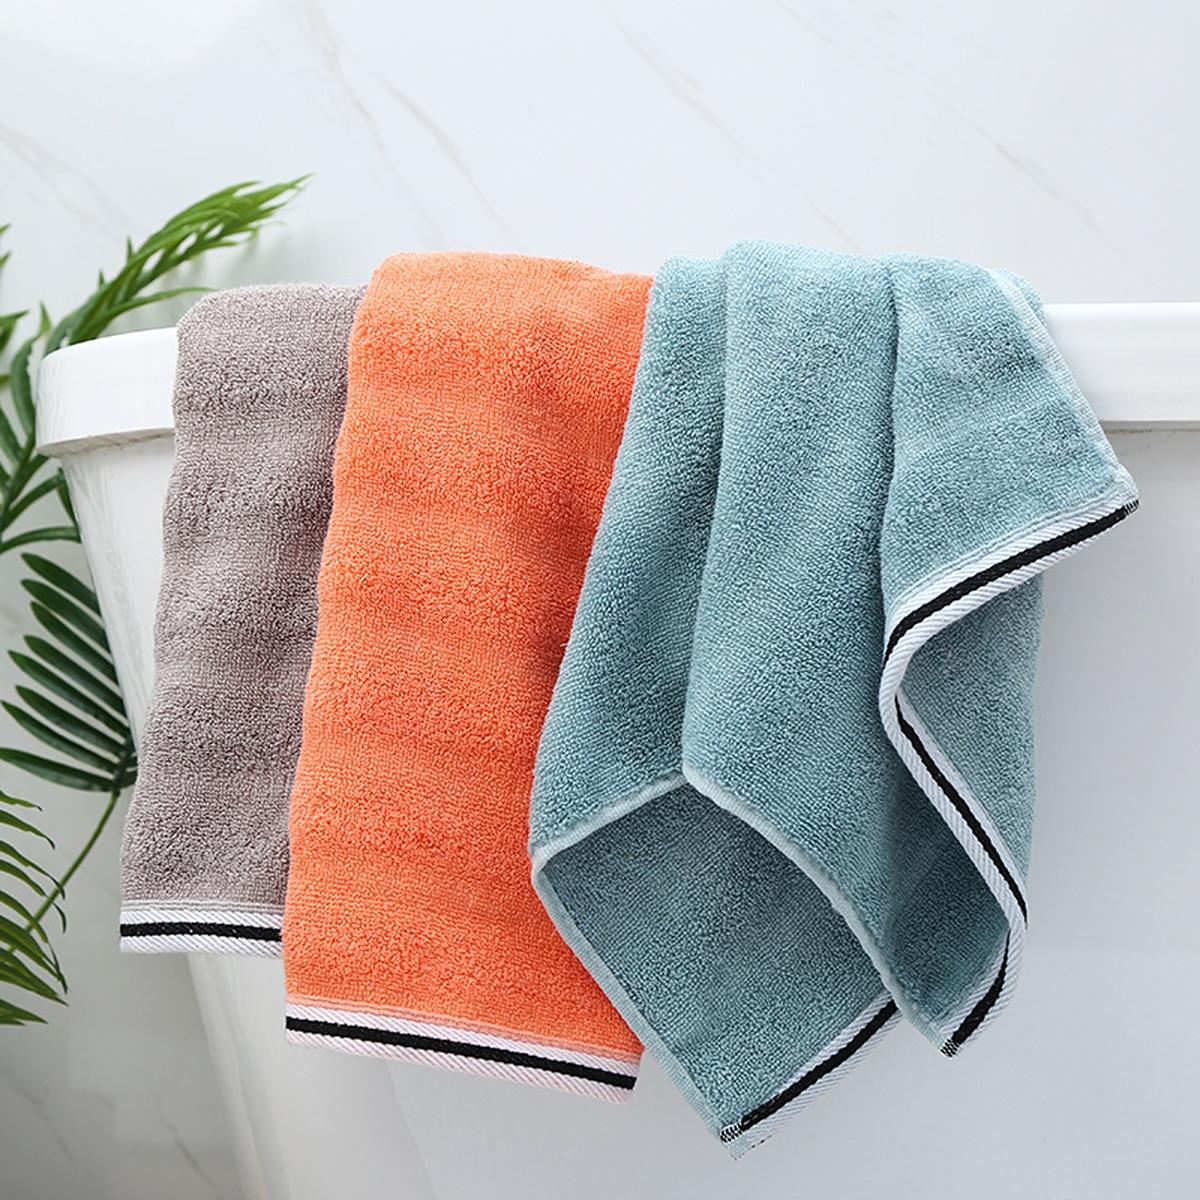 1 st gewoon absorberende handdoek